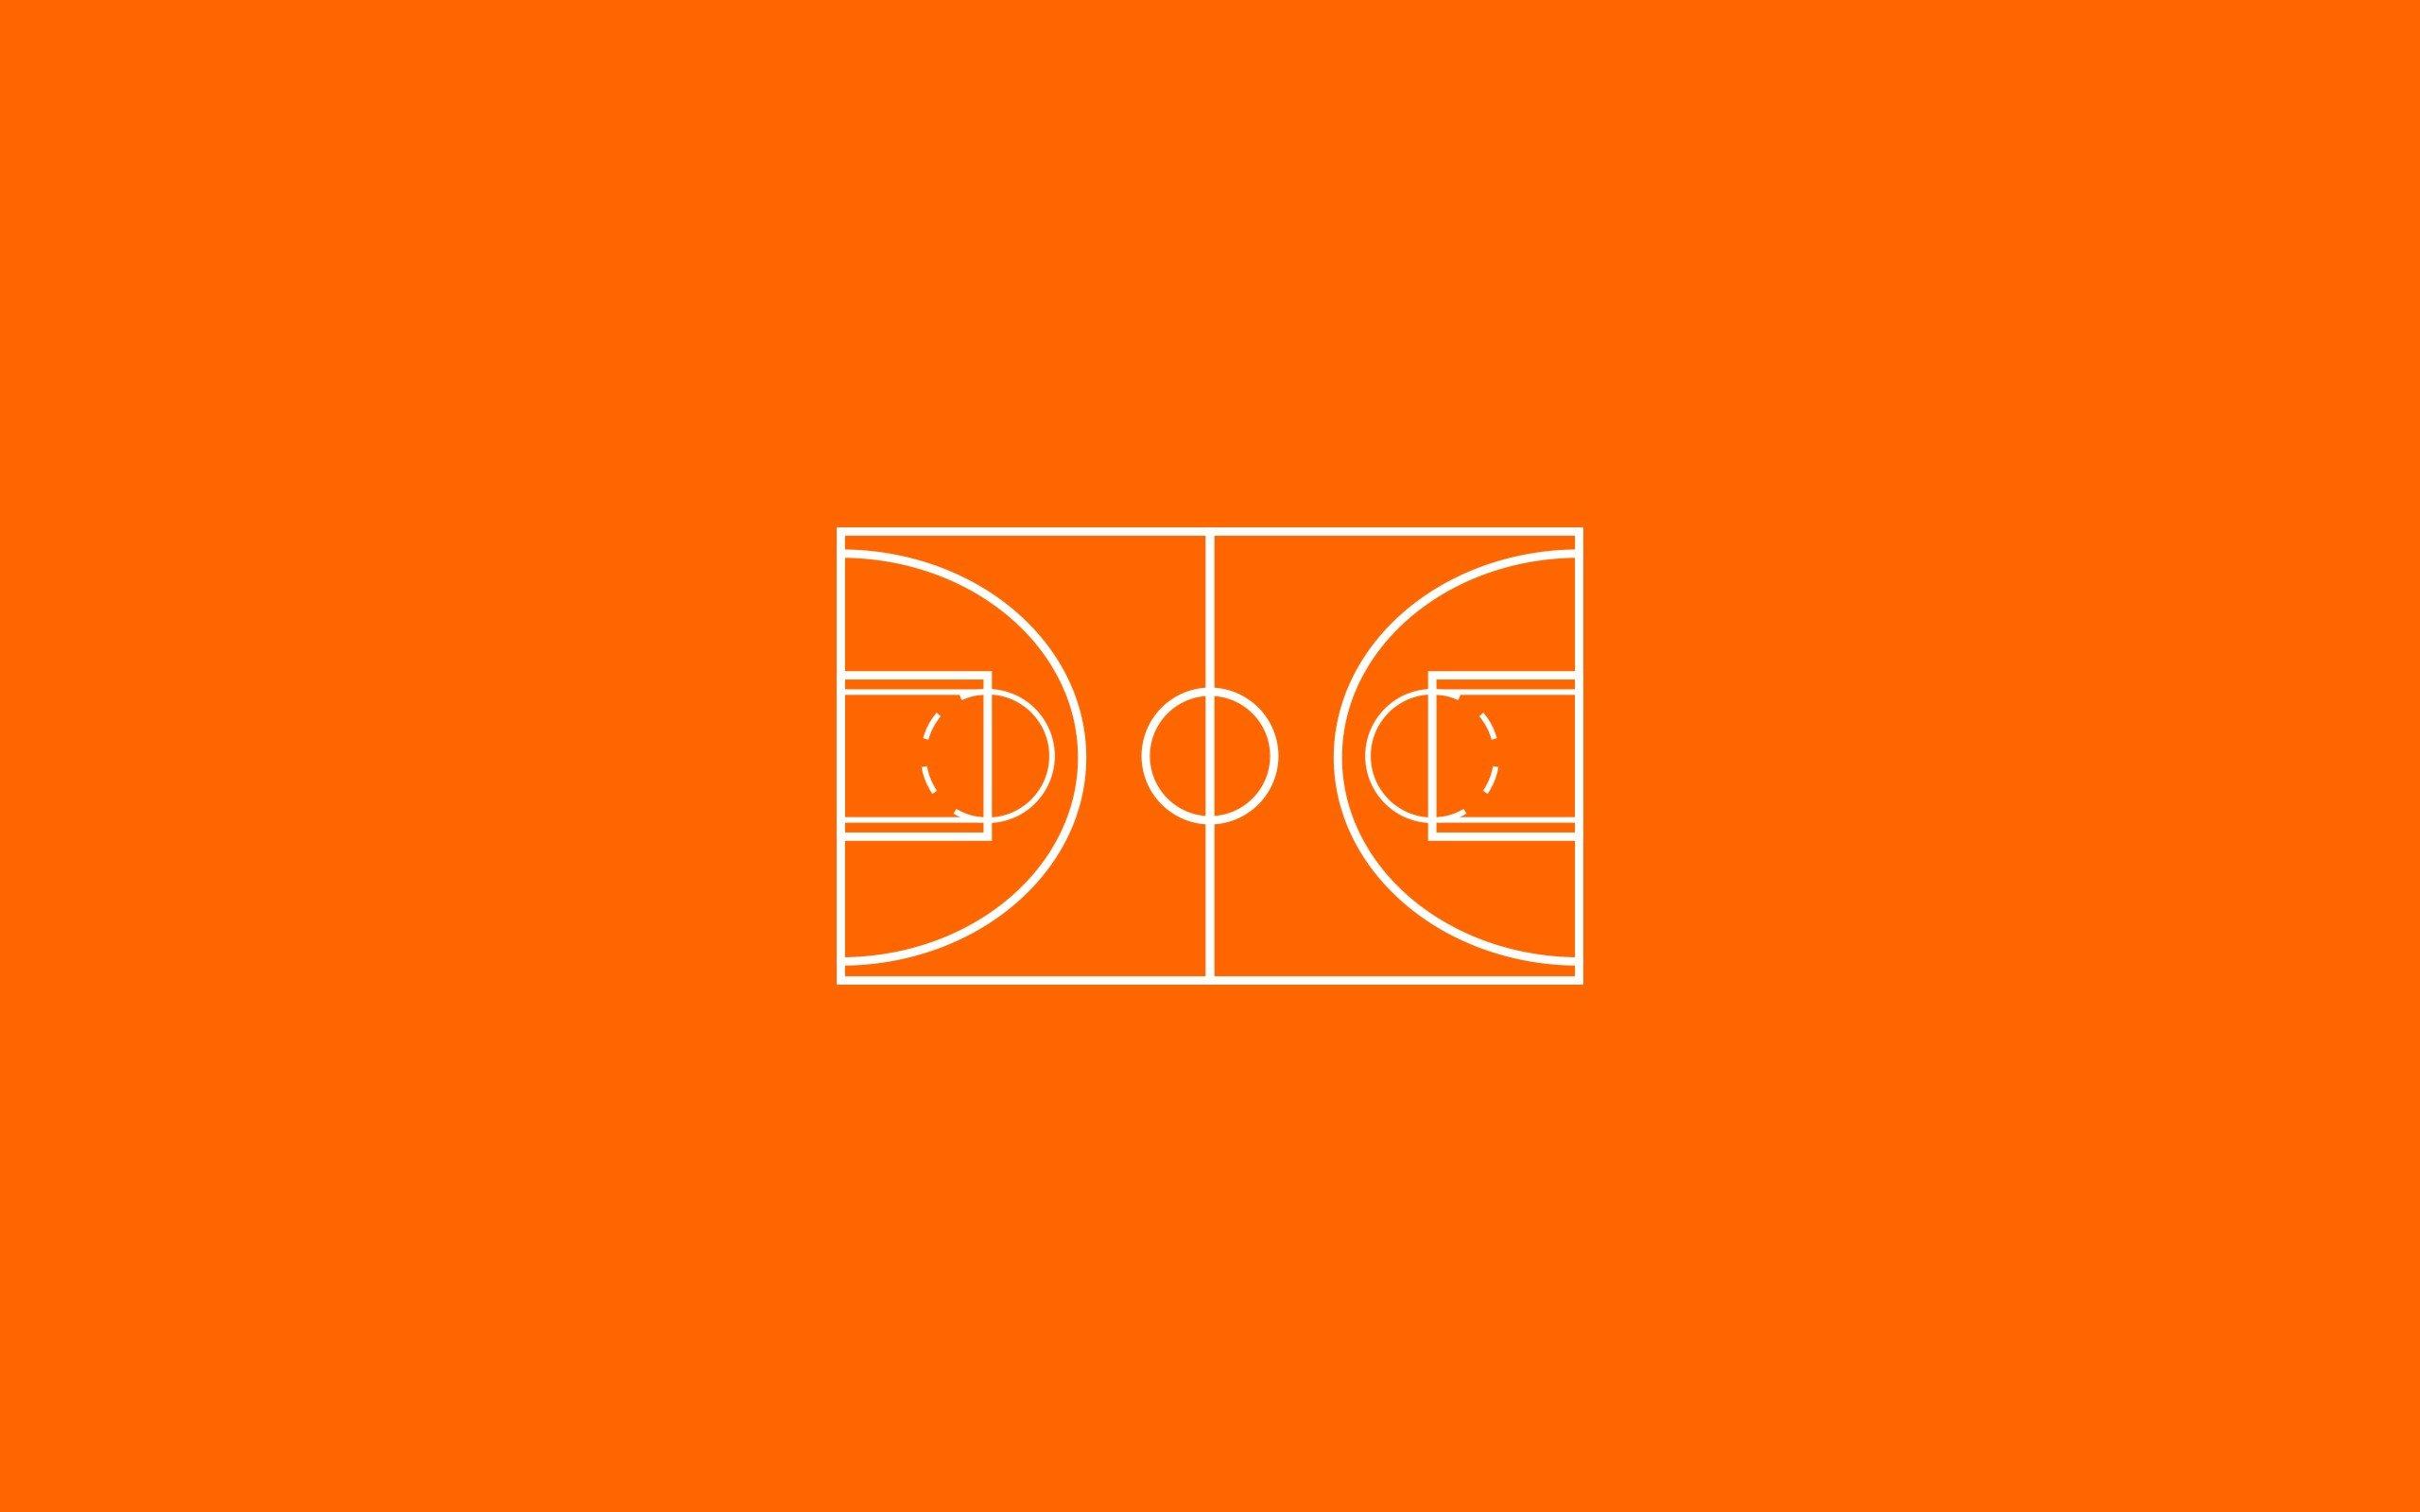 minimalism basketball court wallpaper 2560x1600 493665